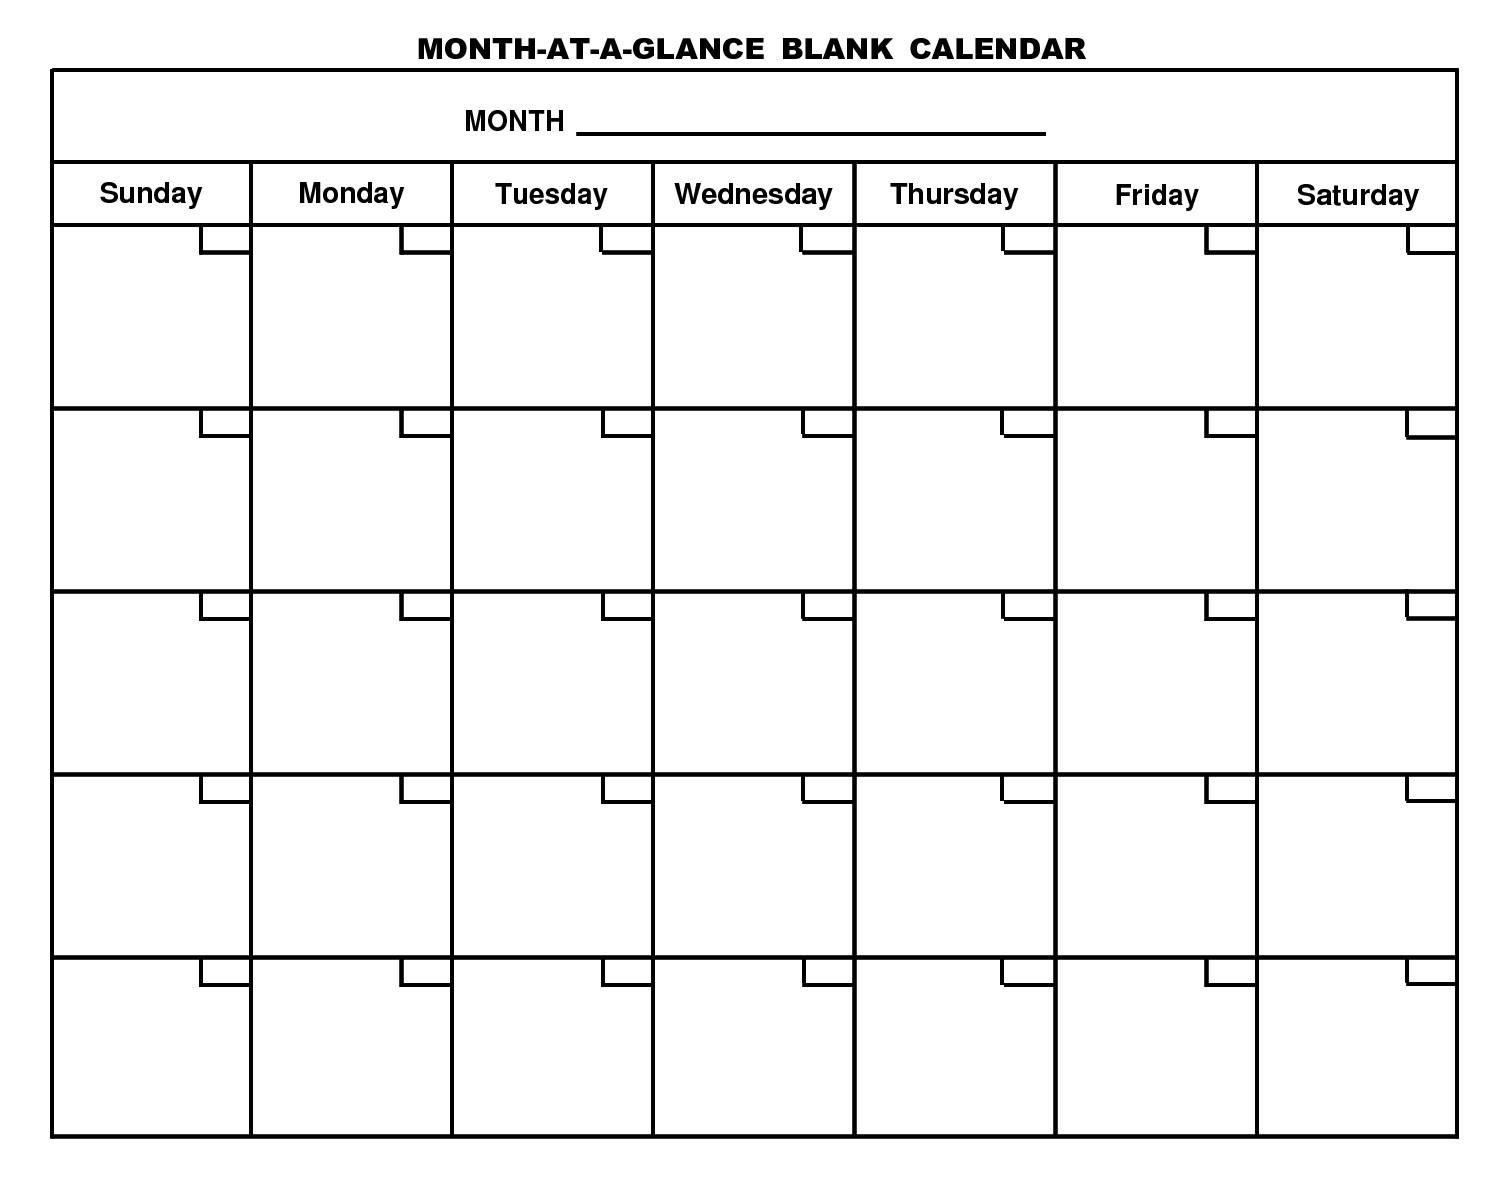 Blank Word Calendar Jose Mulinohouse Co With Regard To Blank_Blank Calendar In Word